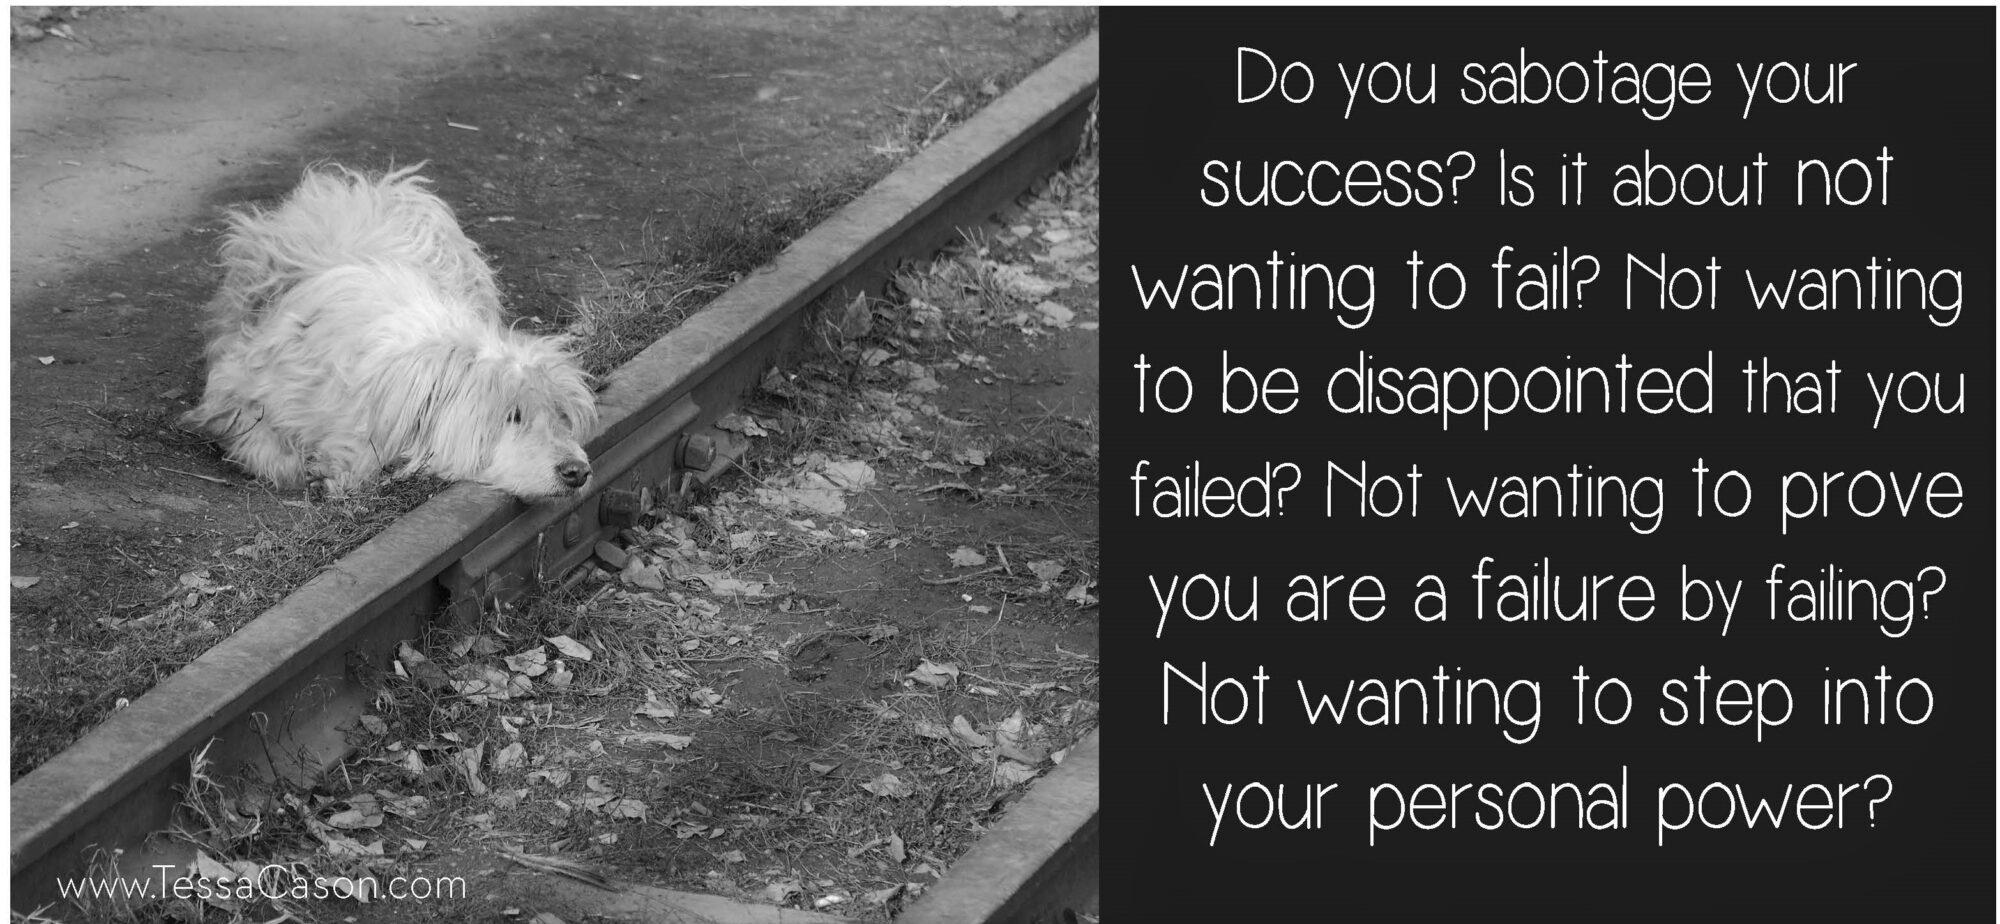 Do You Sabotage Your Success